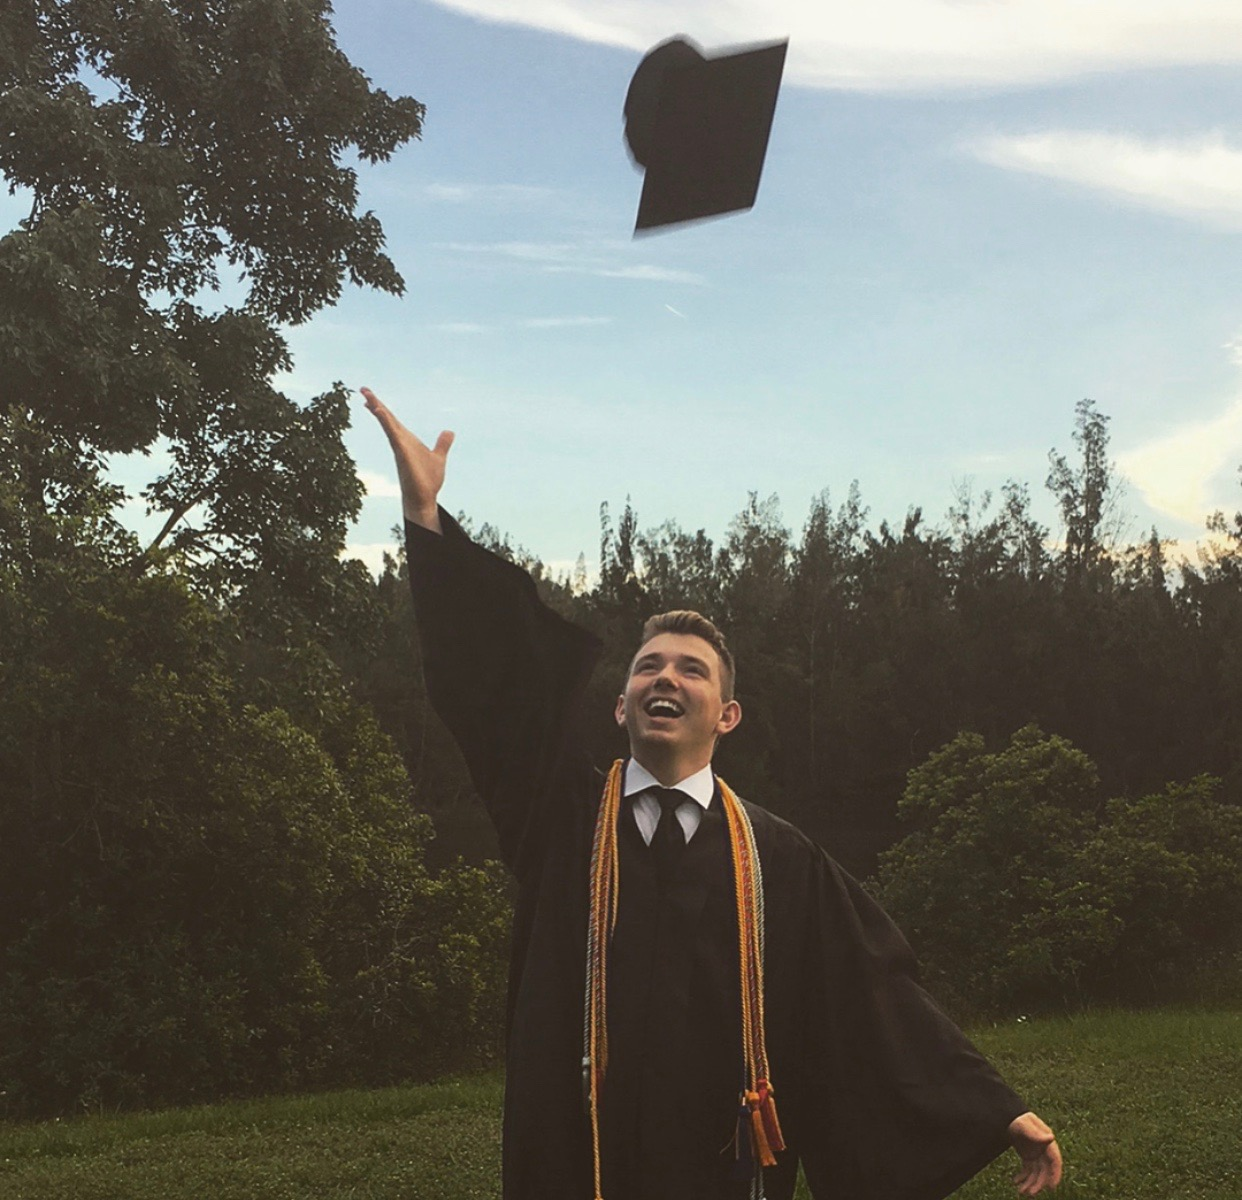 Senior Brian Inerfeld celebrates graduating high school on June 1.